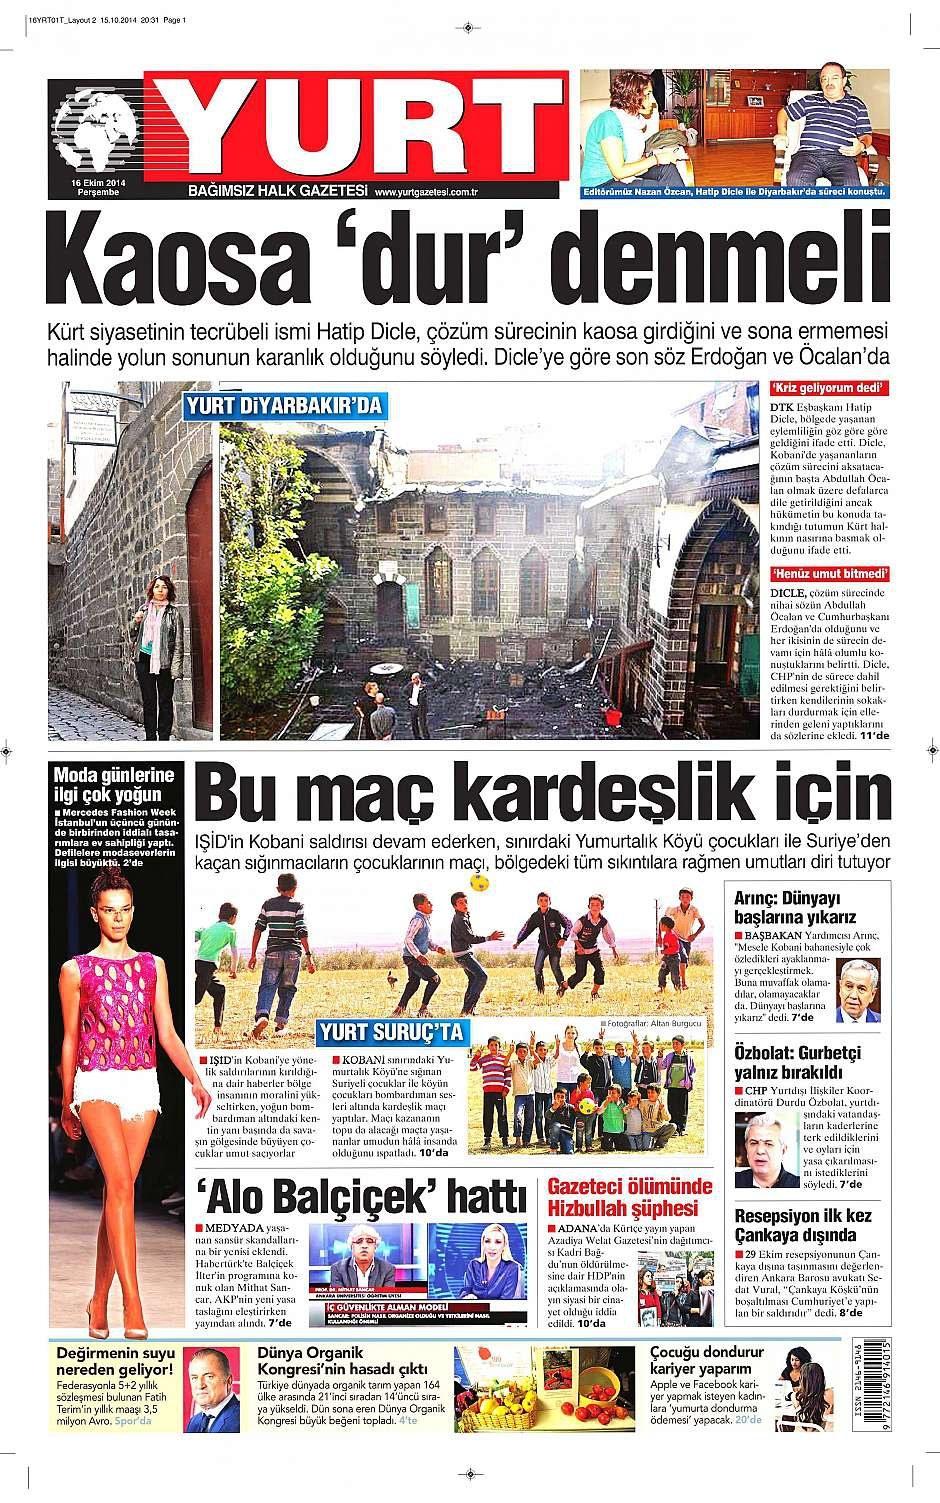 16 Ekim 2014 gazete manşetleri 22